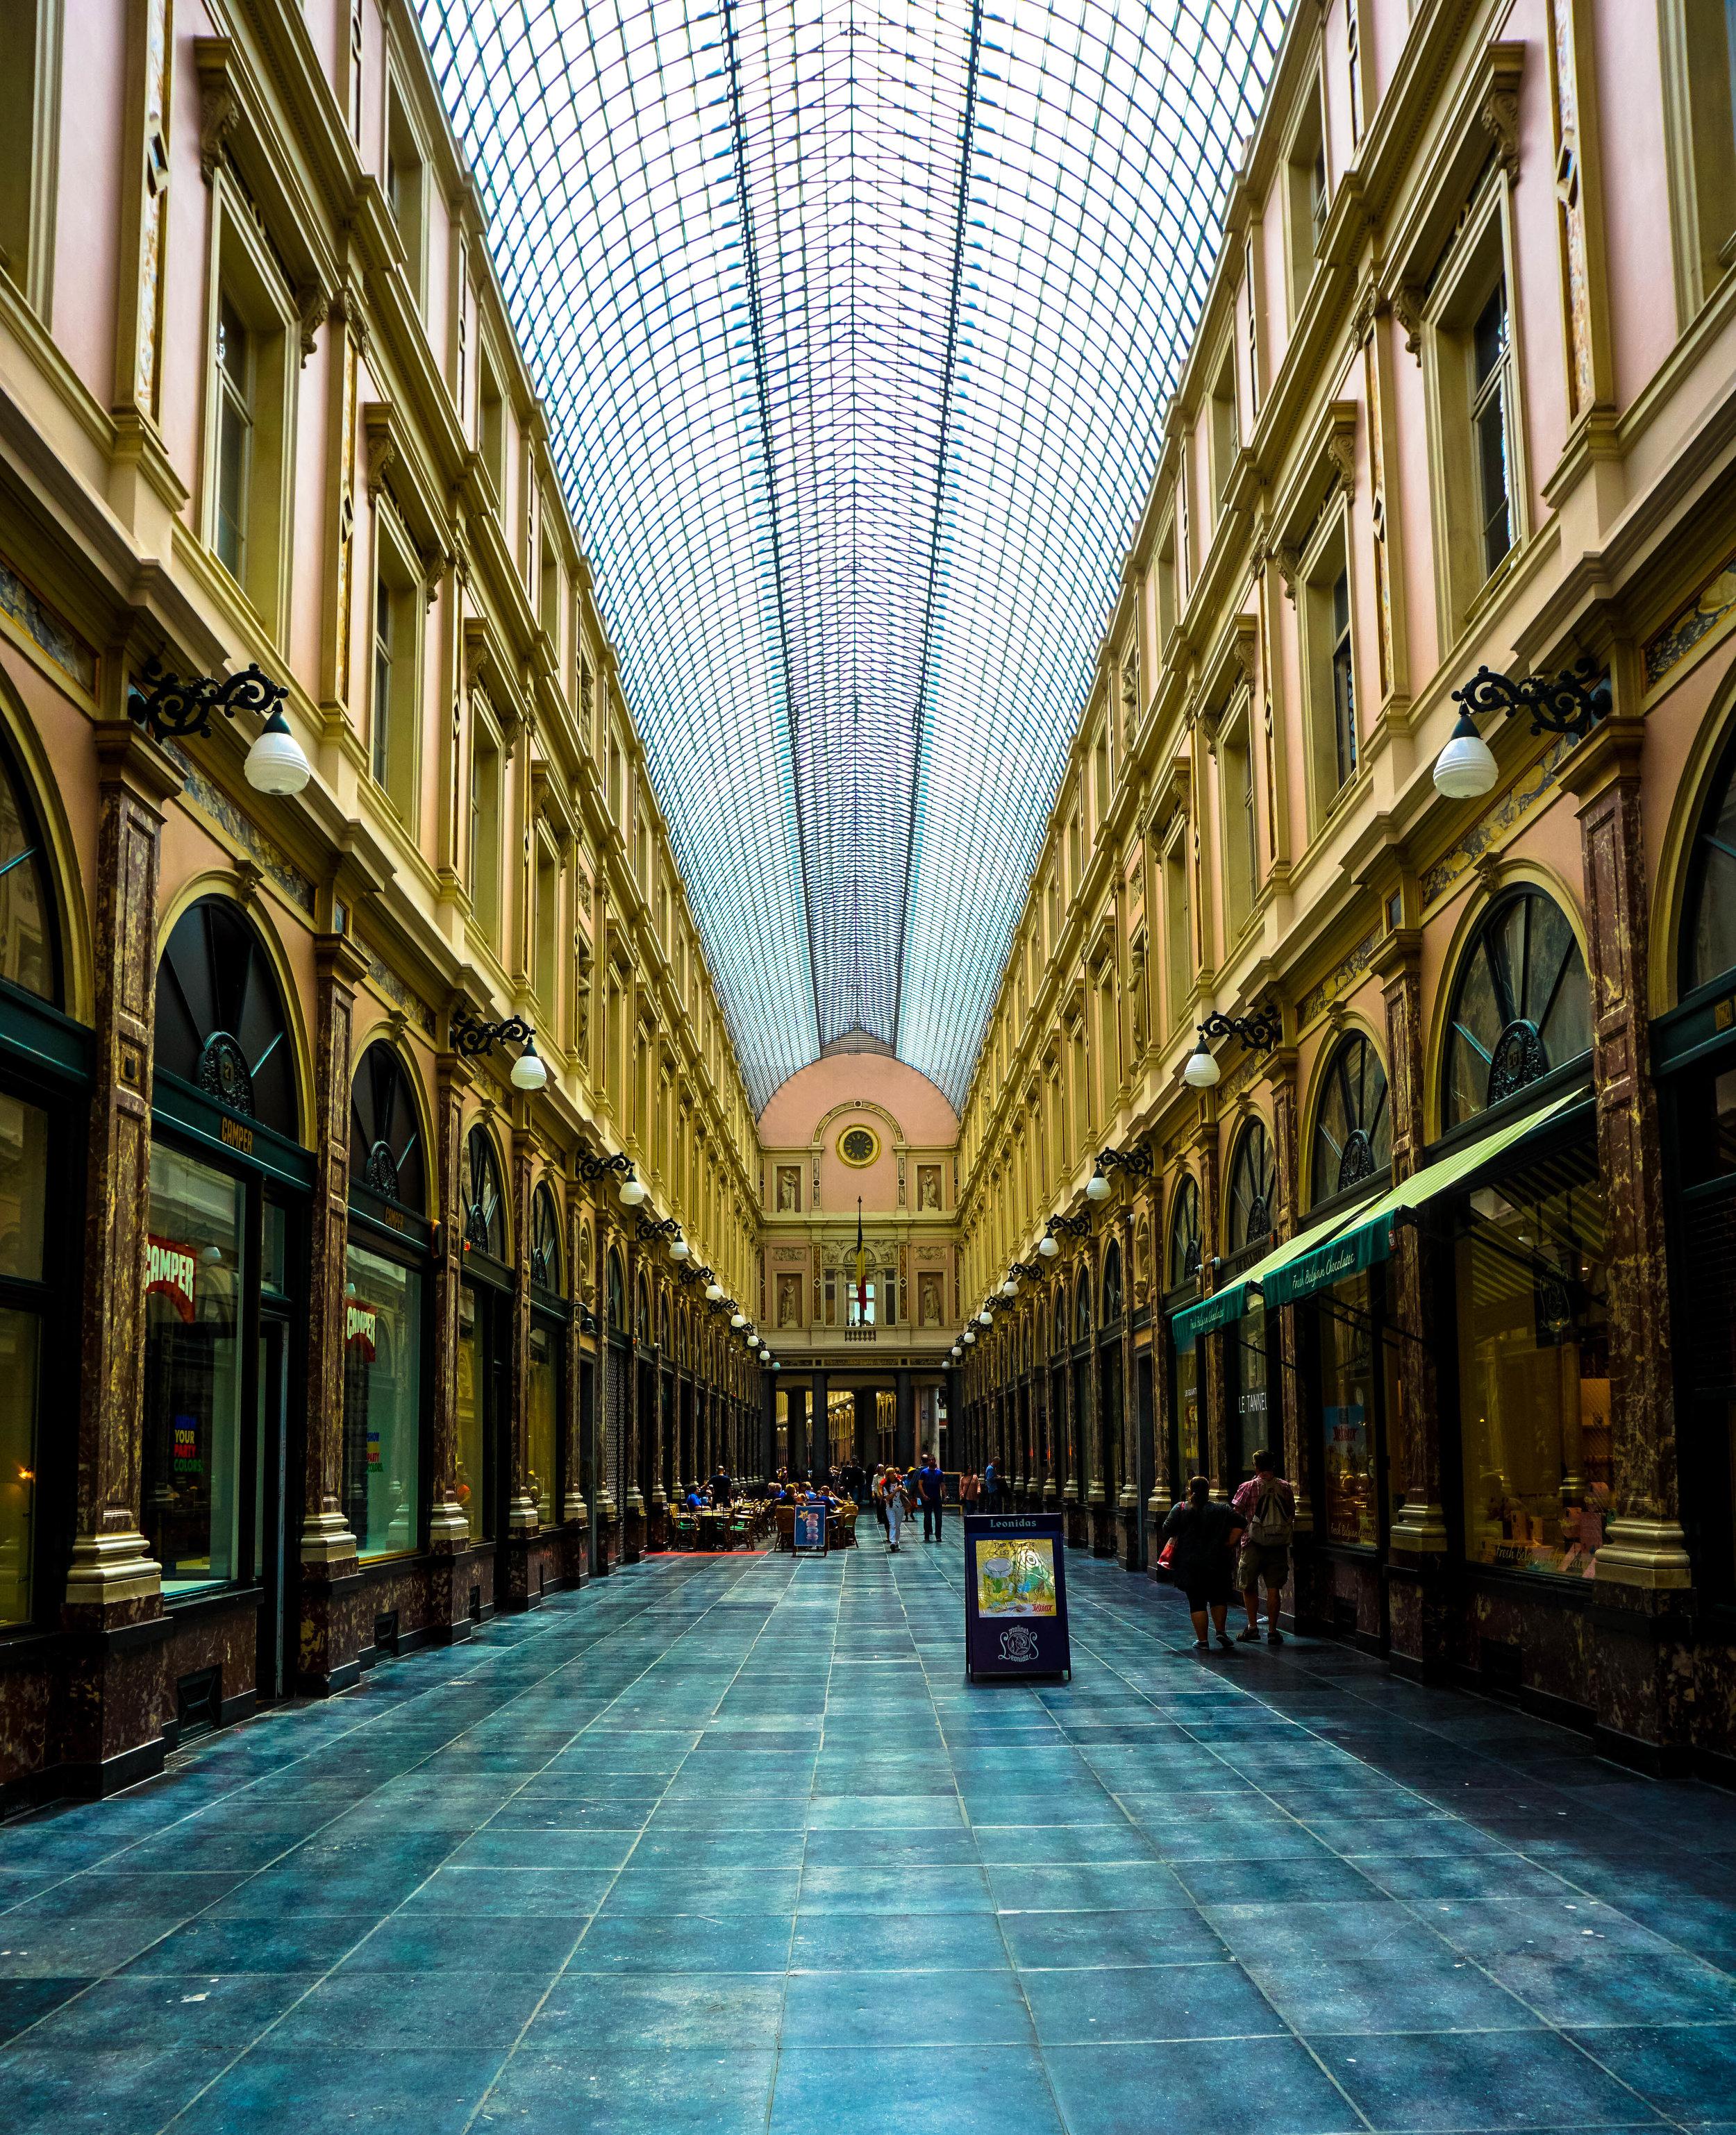 Les Galeries Royales Saint-Hubert (Day), Brussels